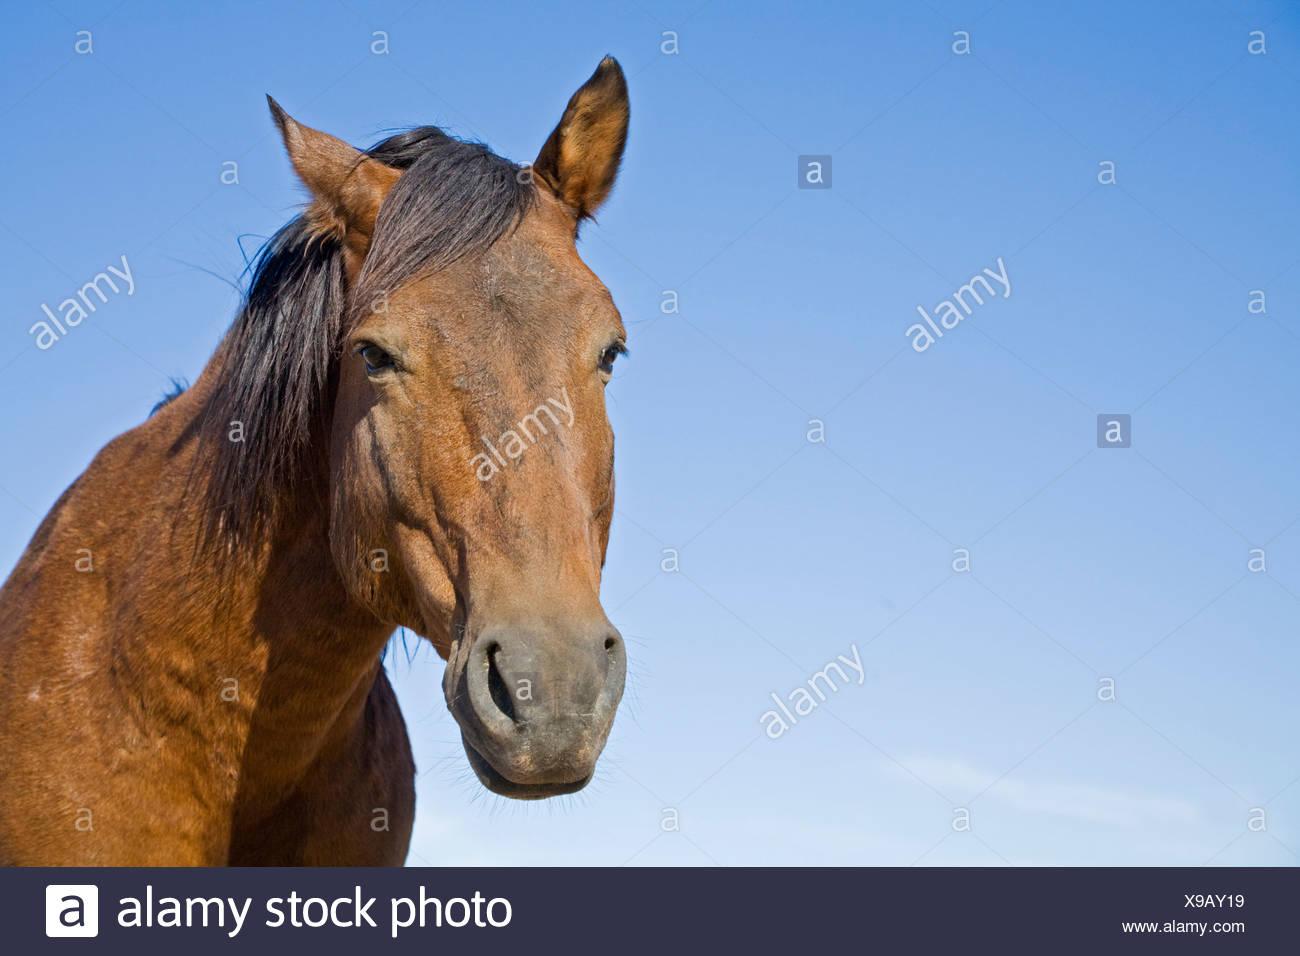 Africa, Namibia, Wild horse, portrait, close-up - Stock Image